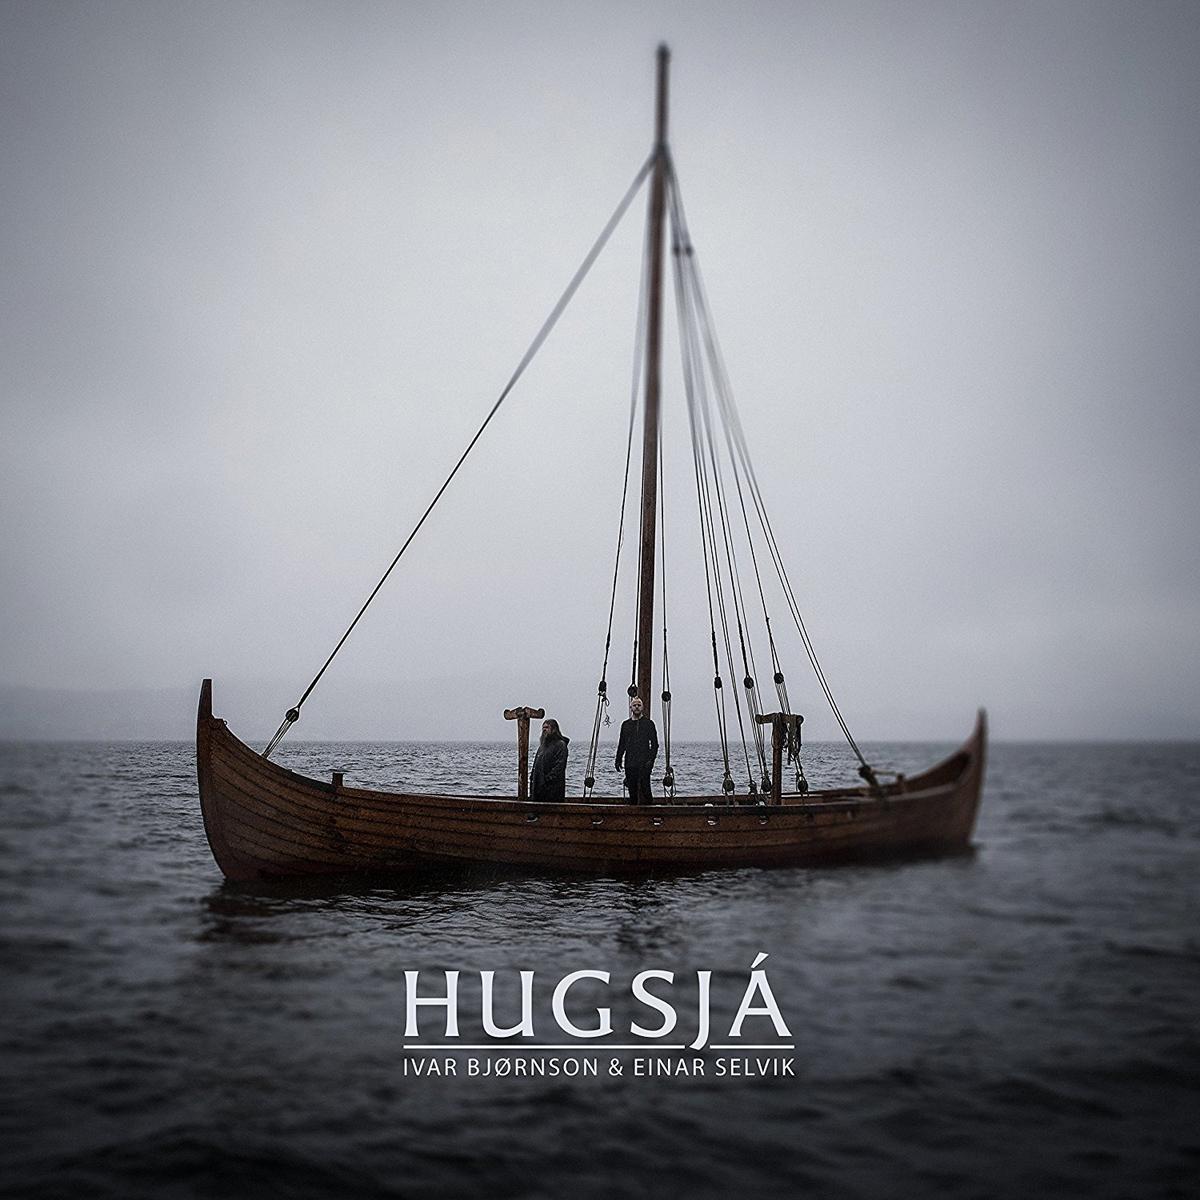 Ivar Bjornson,Einar Selvik Ivar Bjornson & Einar Selvik. Hugsja (2 LP) ivar bjornson einar selvik ivar bjornson